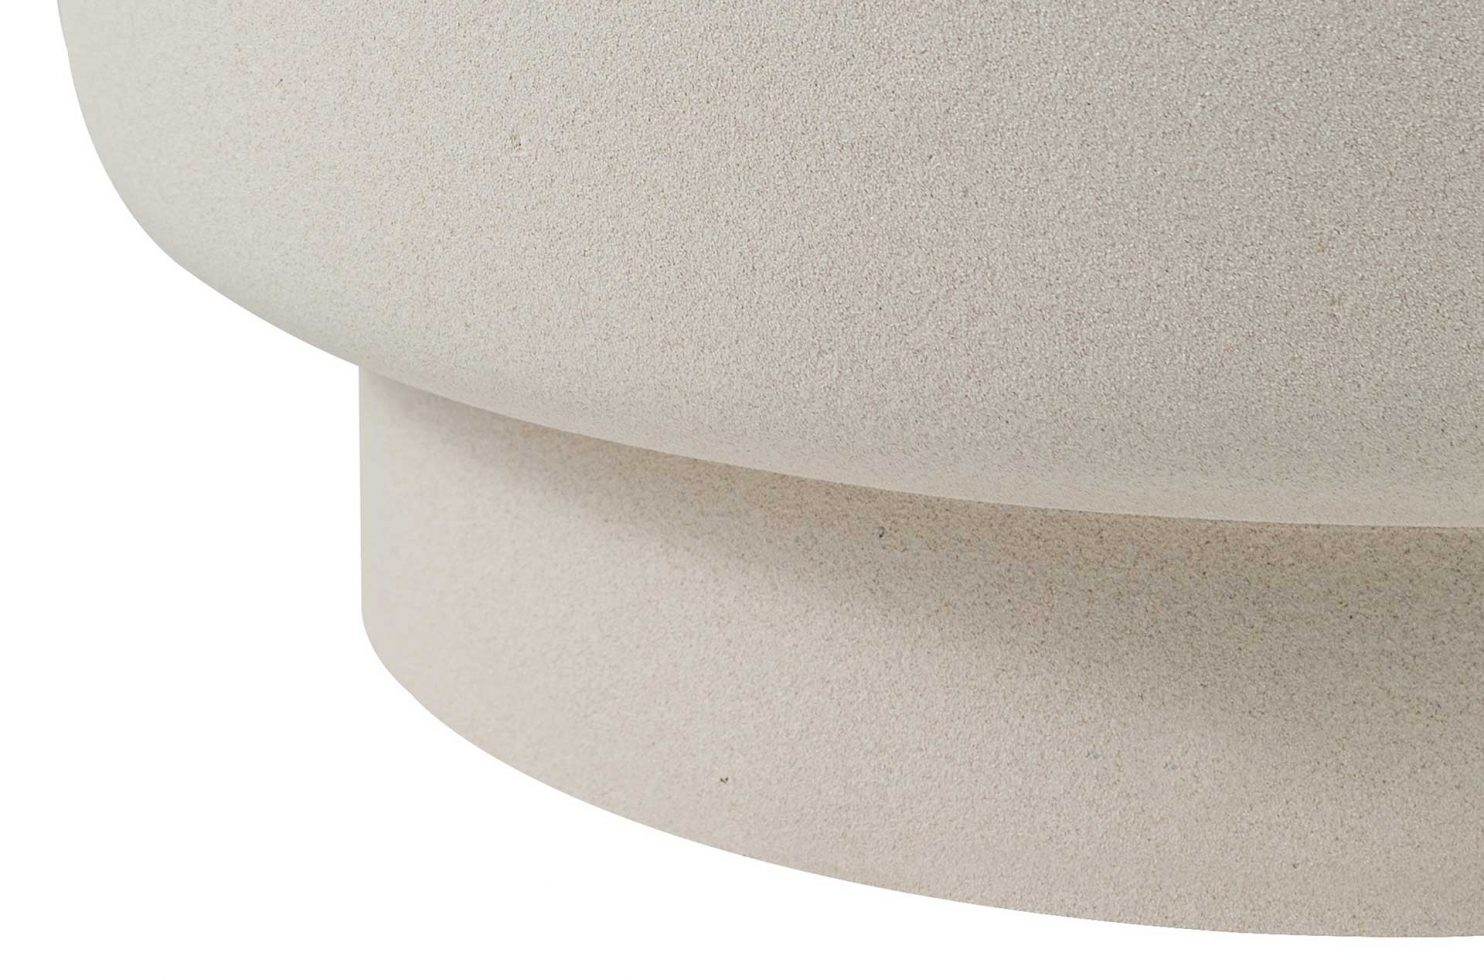 prov cer balance stool 16in C30804035 sand dtl2 web